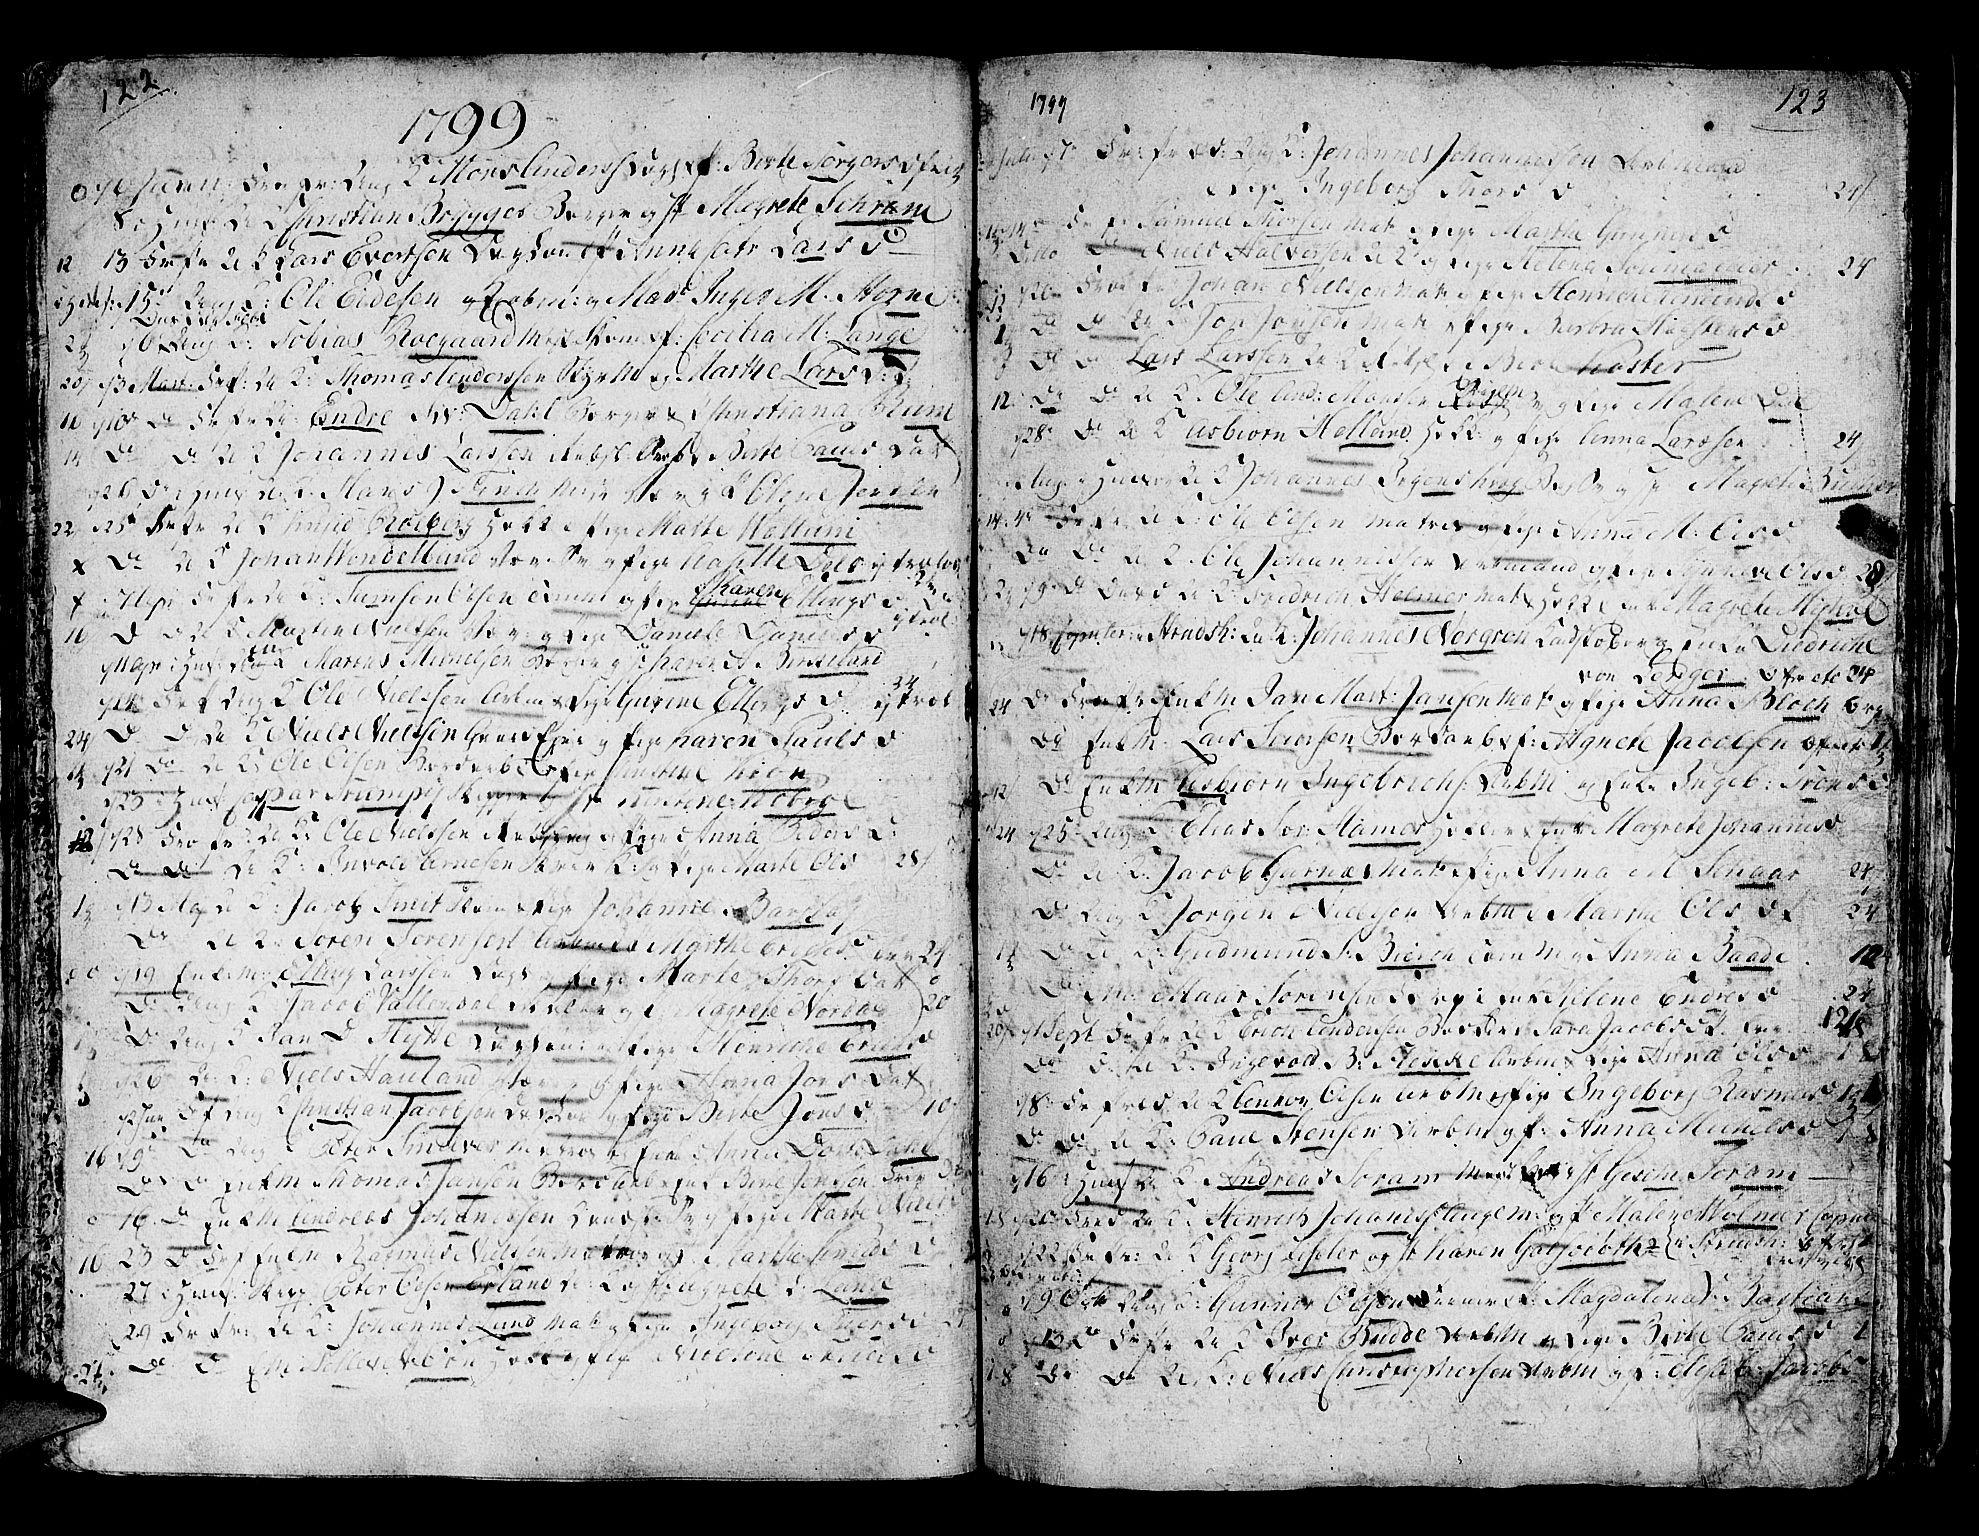 SAB, Domkirken Sokneprestembete, H/Haa/L0007: Ministerialbok nr. A 7, 1725-1826, s. 122-123